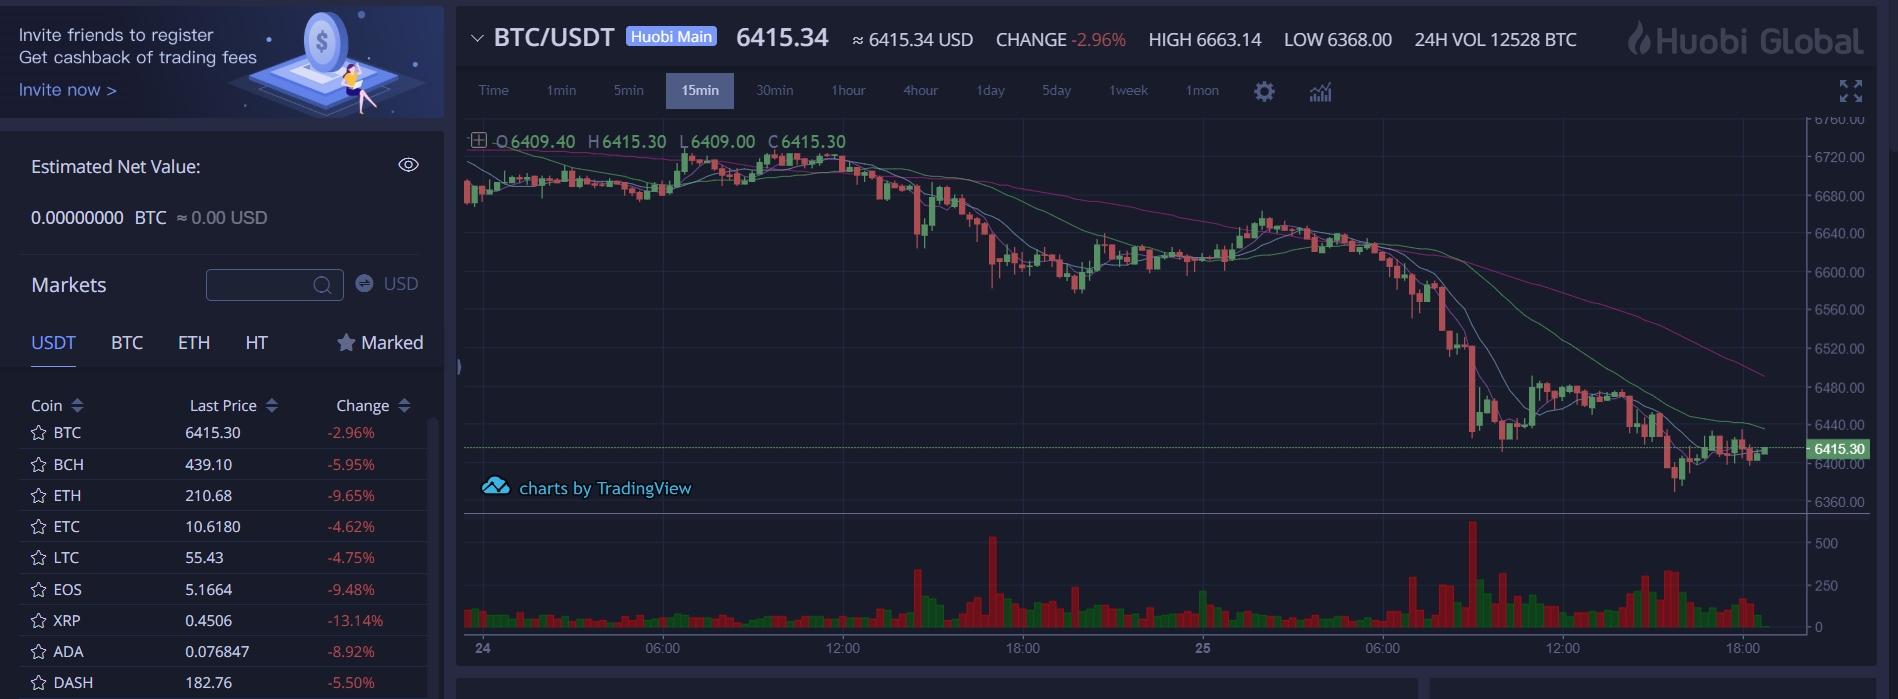 Huobi trading charts